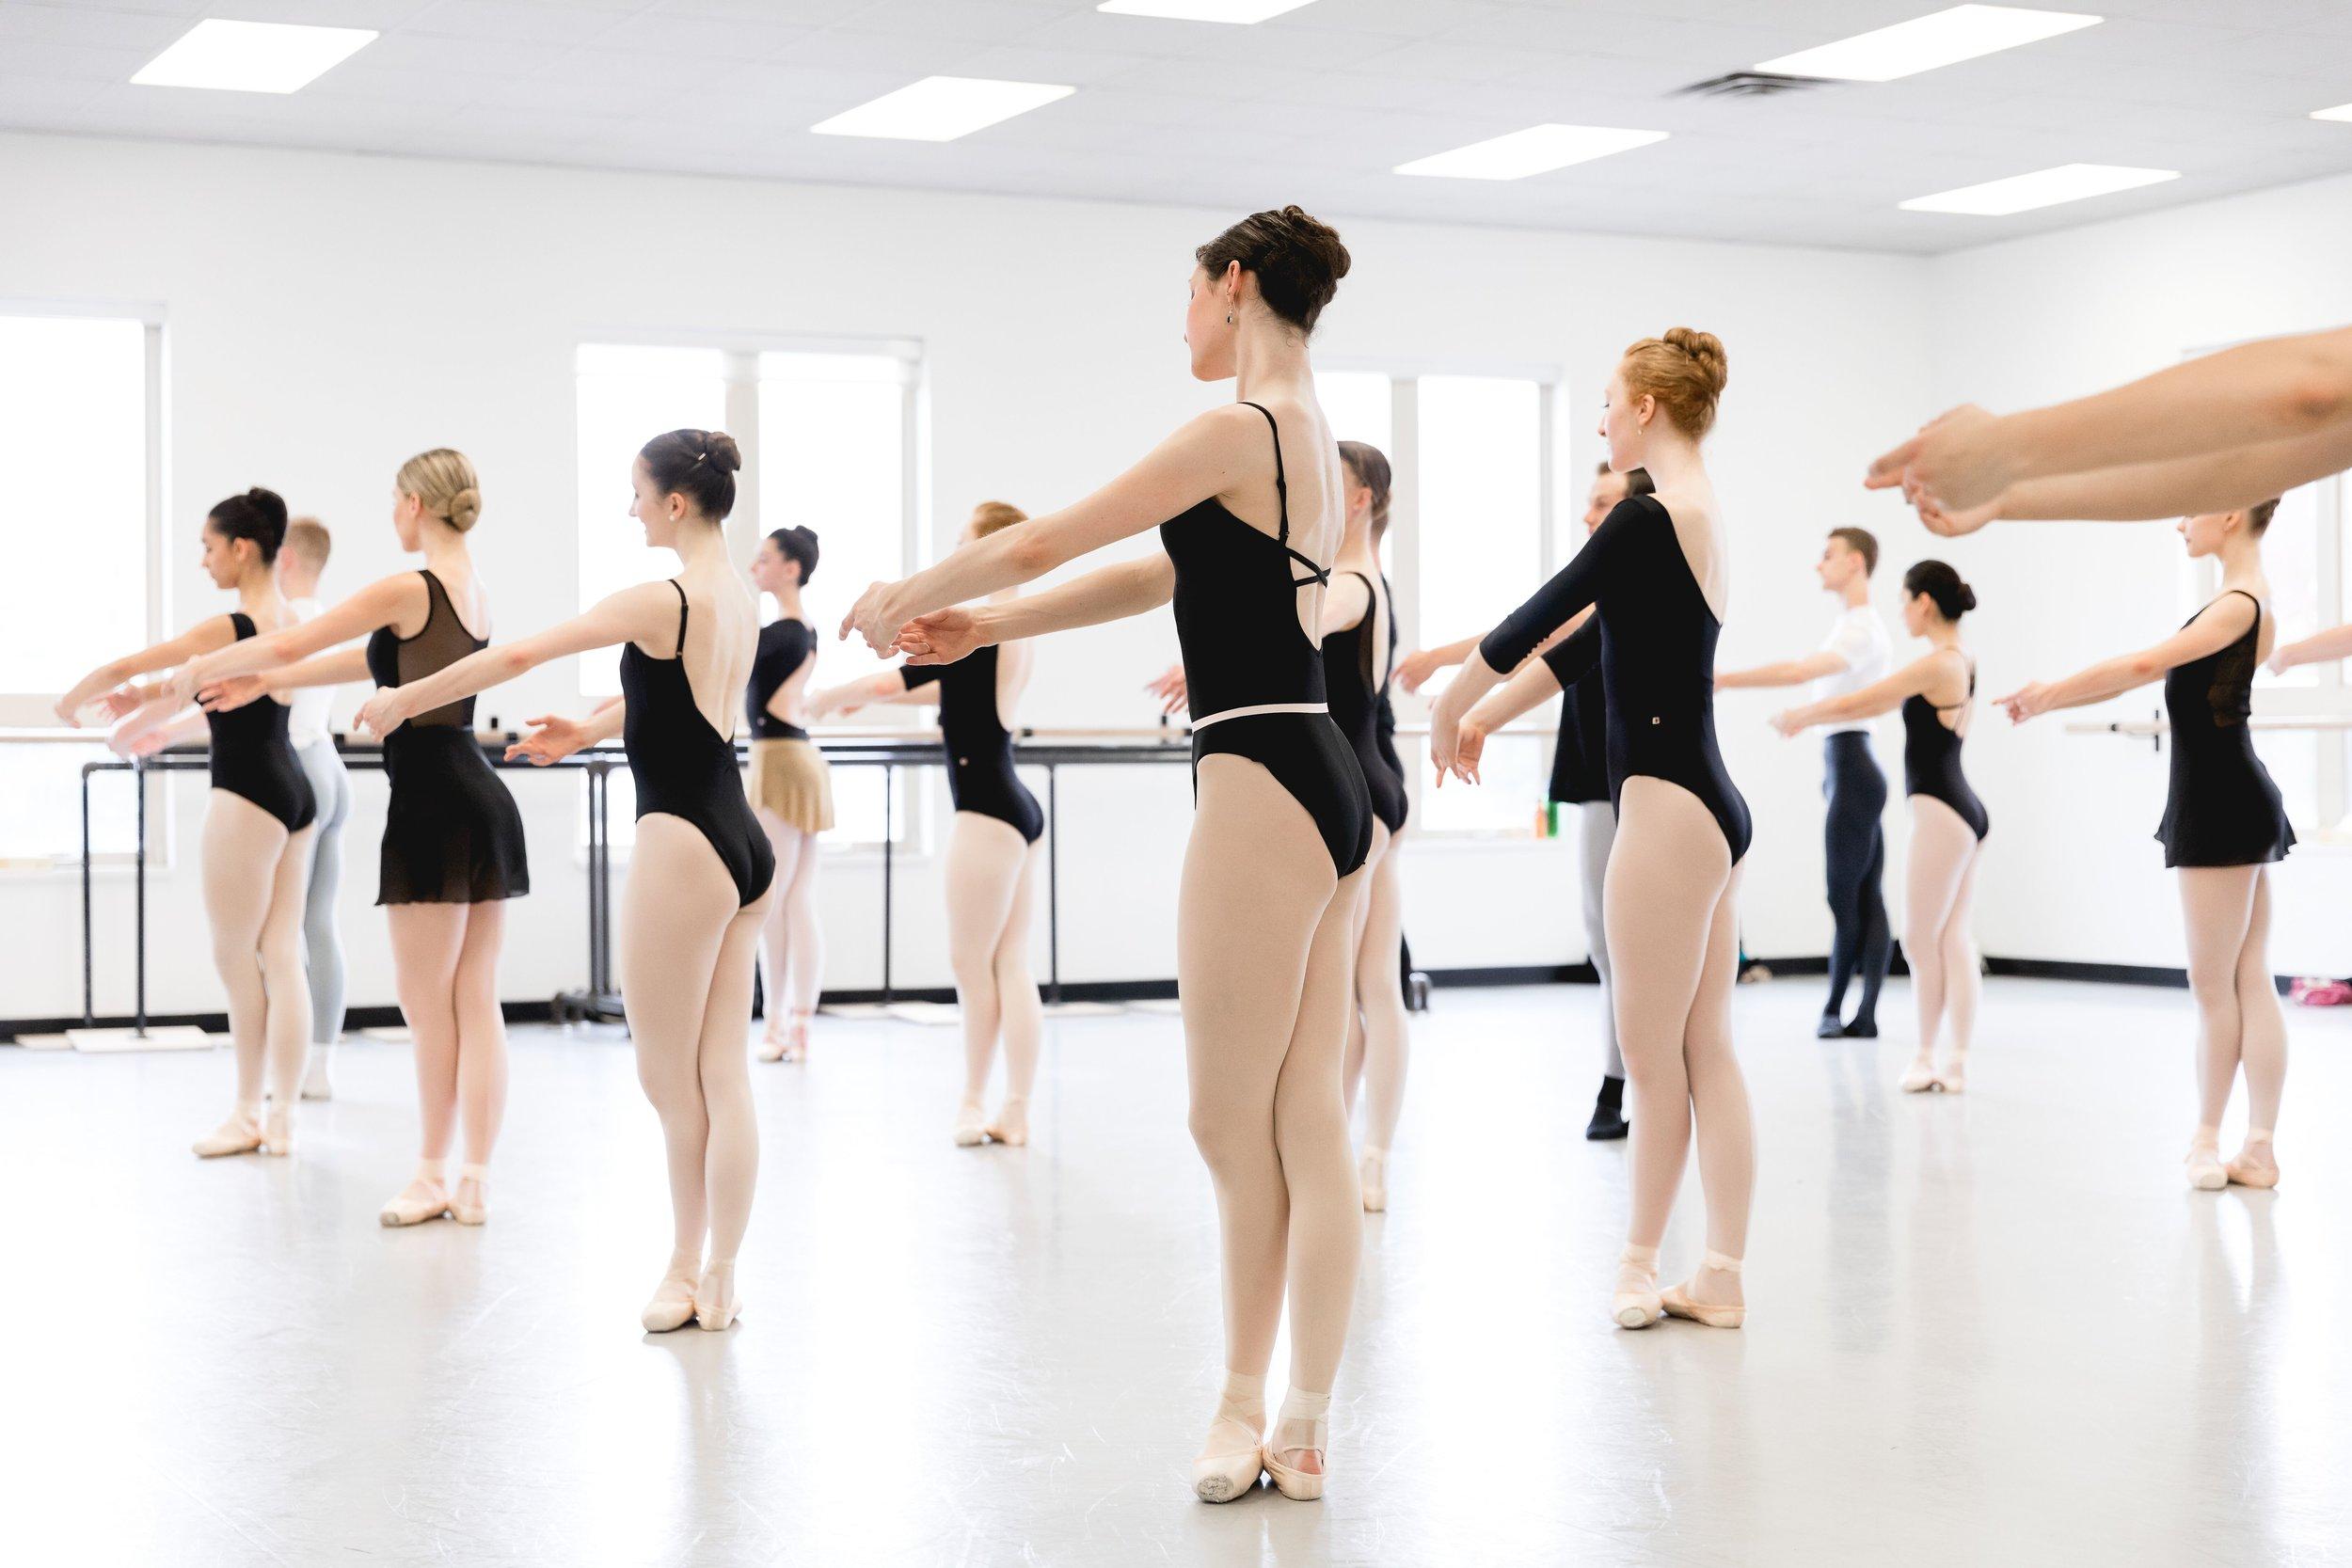 BALLET WEST SUMMER INTENSIVE - Jessie Eccles Quinney Ballet CentreSalt Lake City, UtahJUNE 17TH - JULY 29TH 2019